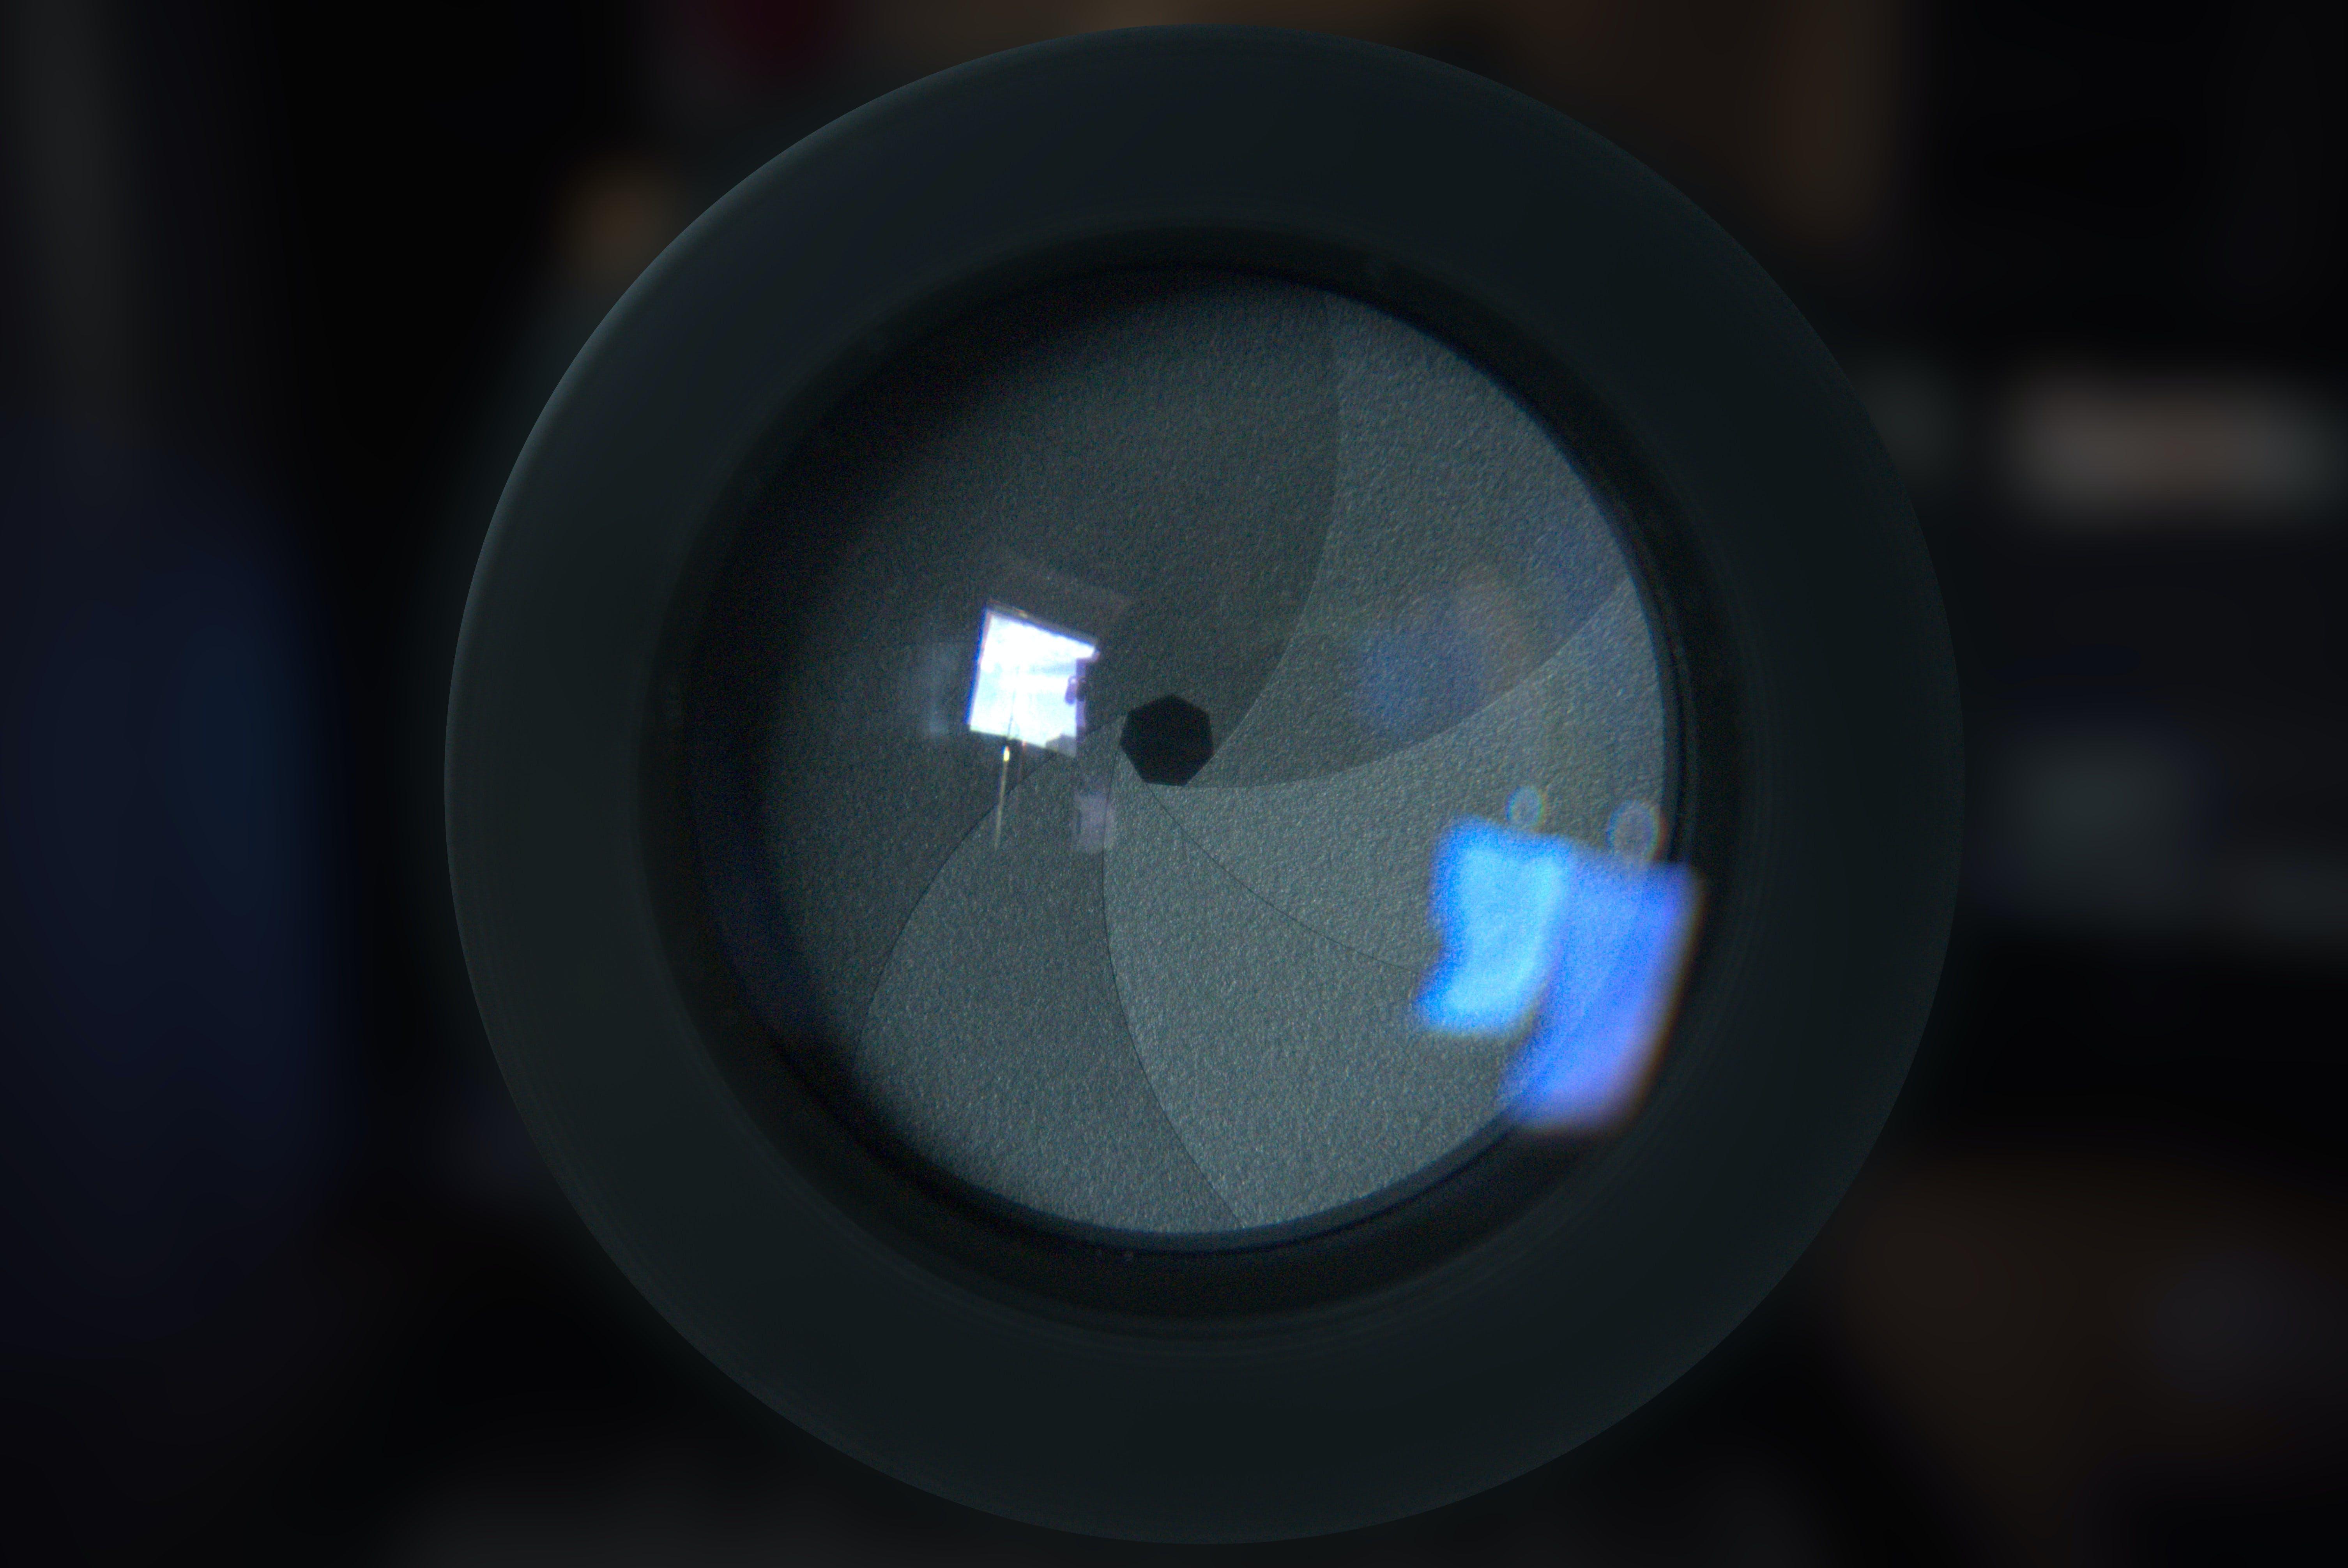 camera, fotography, lens